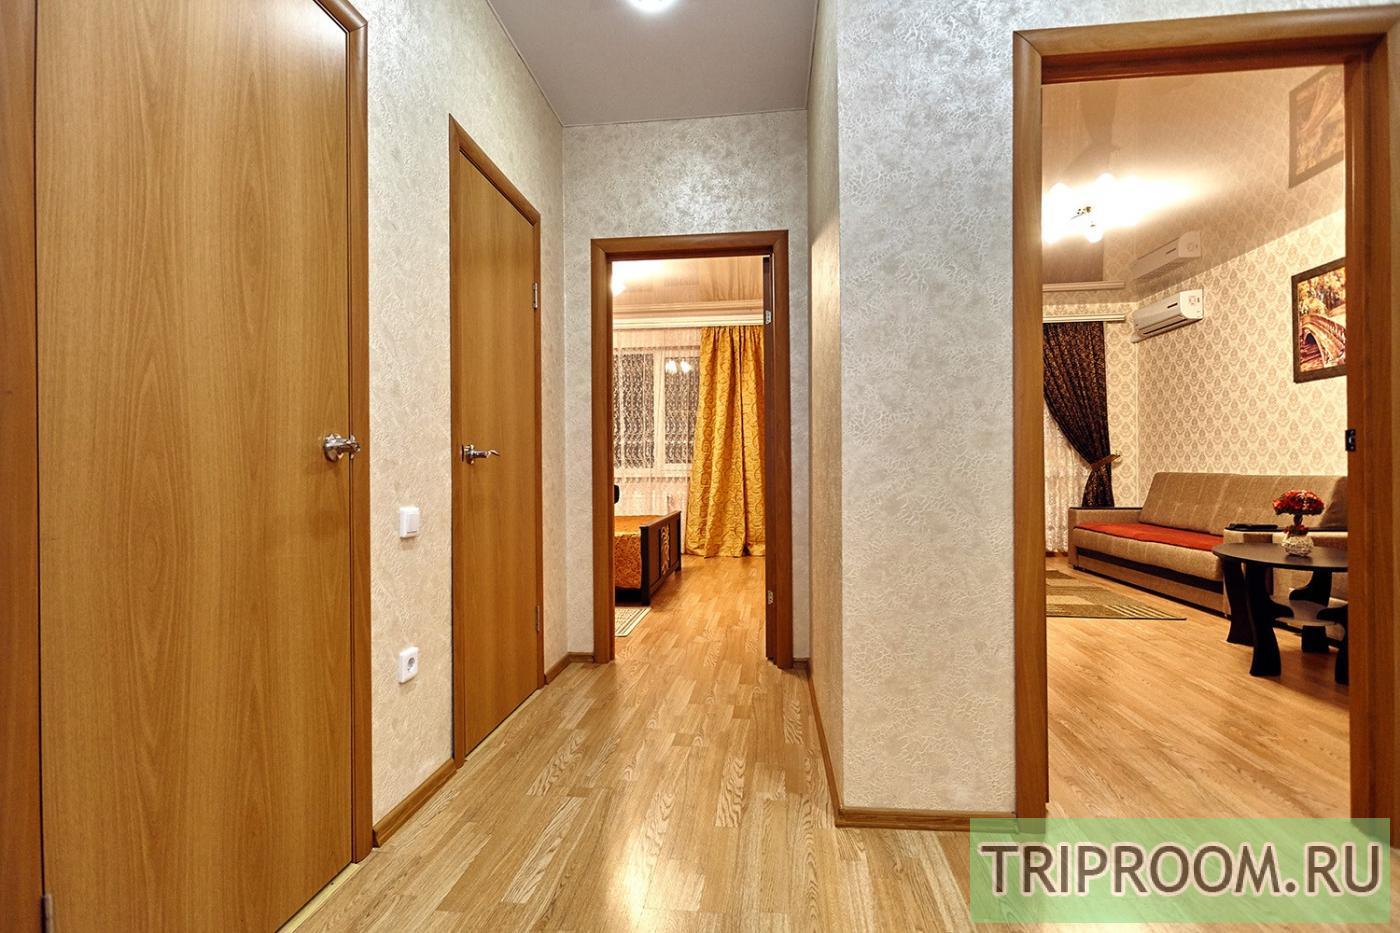 2-комнатная квартира посуточно (вариант № 10581), ул. Соколова улица, фото № 11